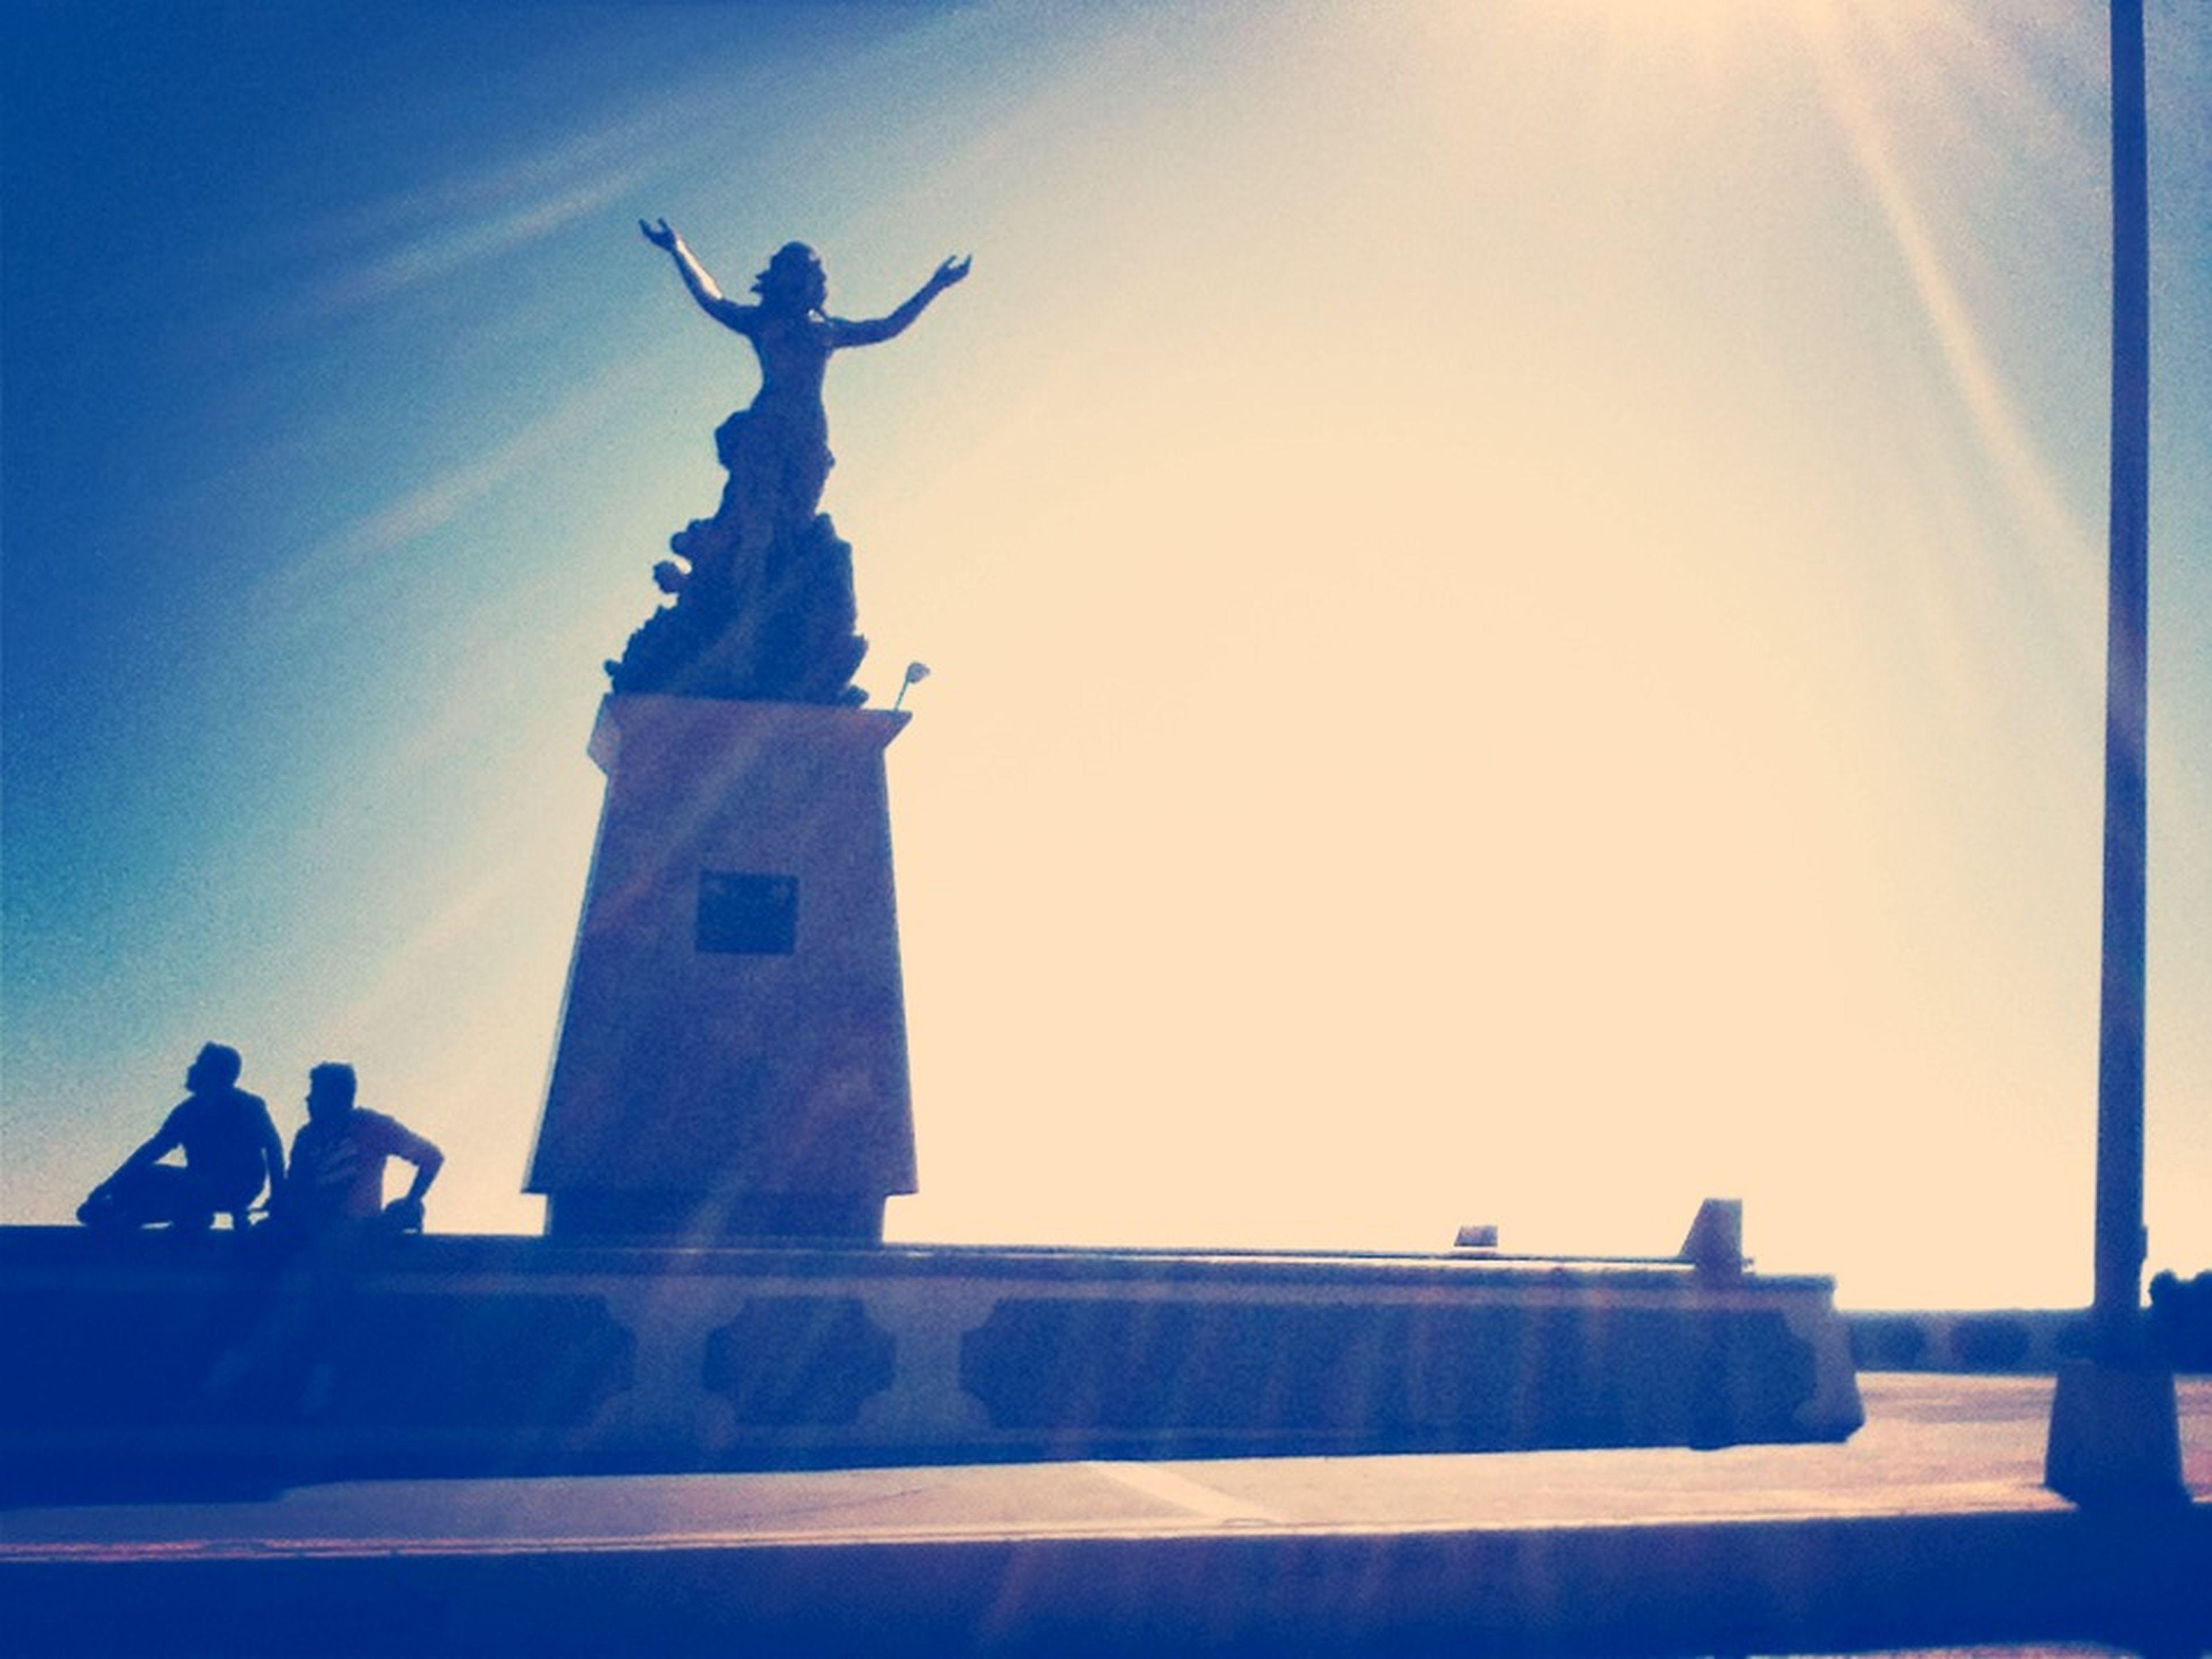 statue, human representation, sculpture, low angle view, clear sky, art and craft, blue, silhouette, art, famous place, creativity, travel, travel destinations, tourism, copy space, sky, built structure, international landmark